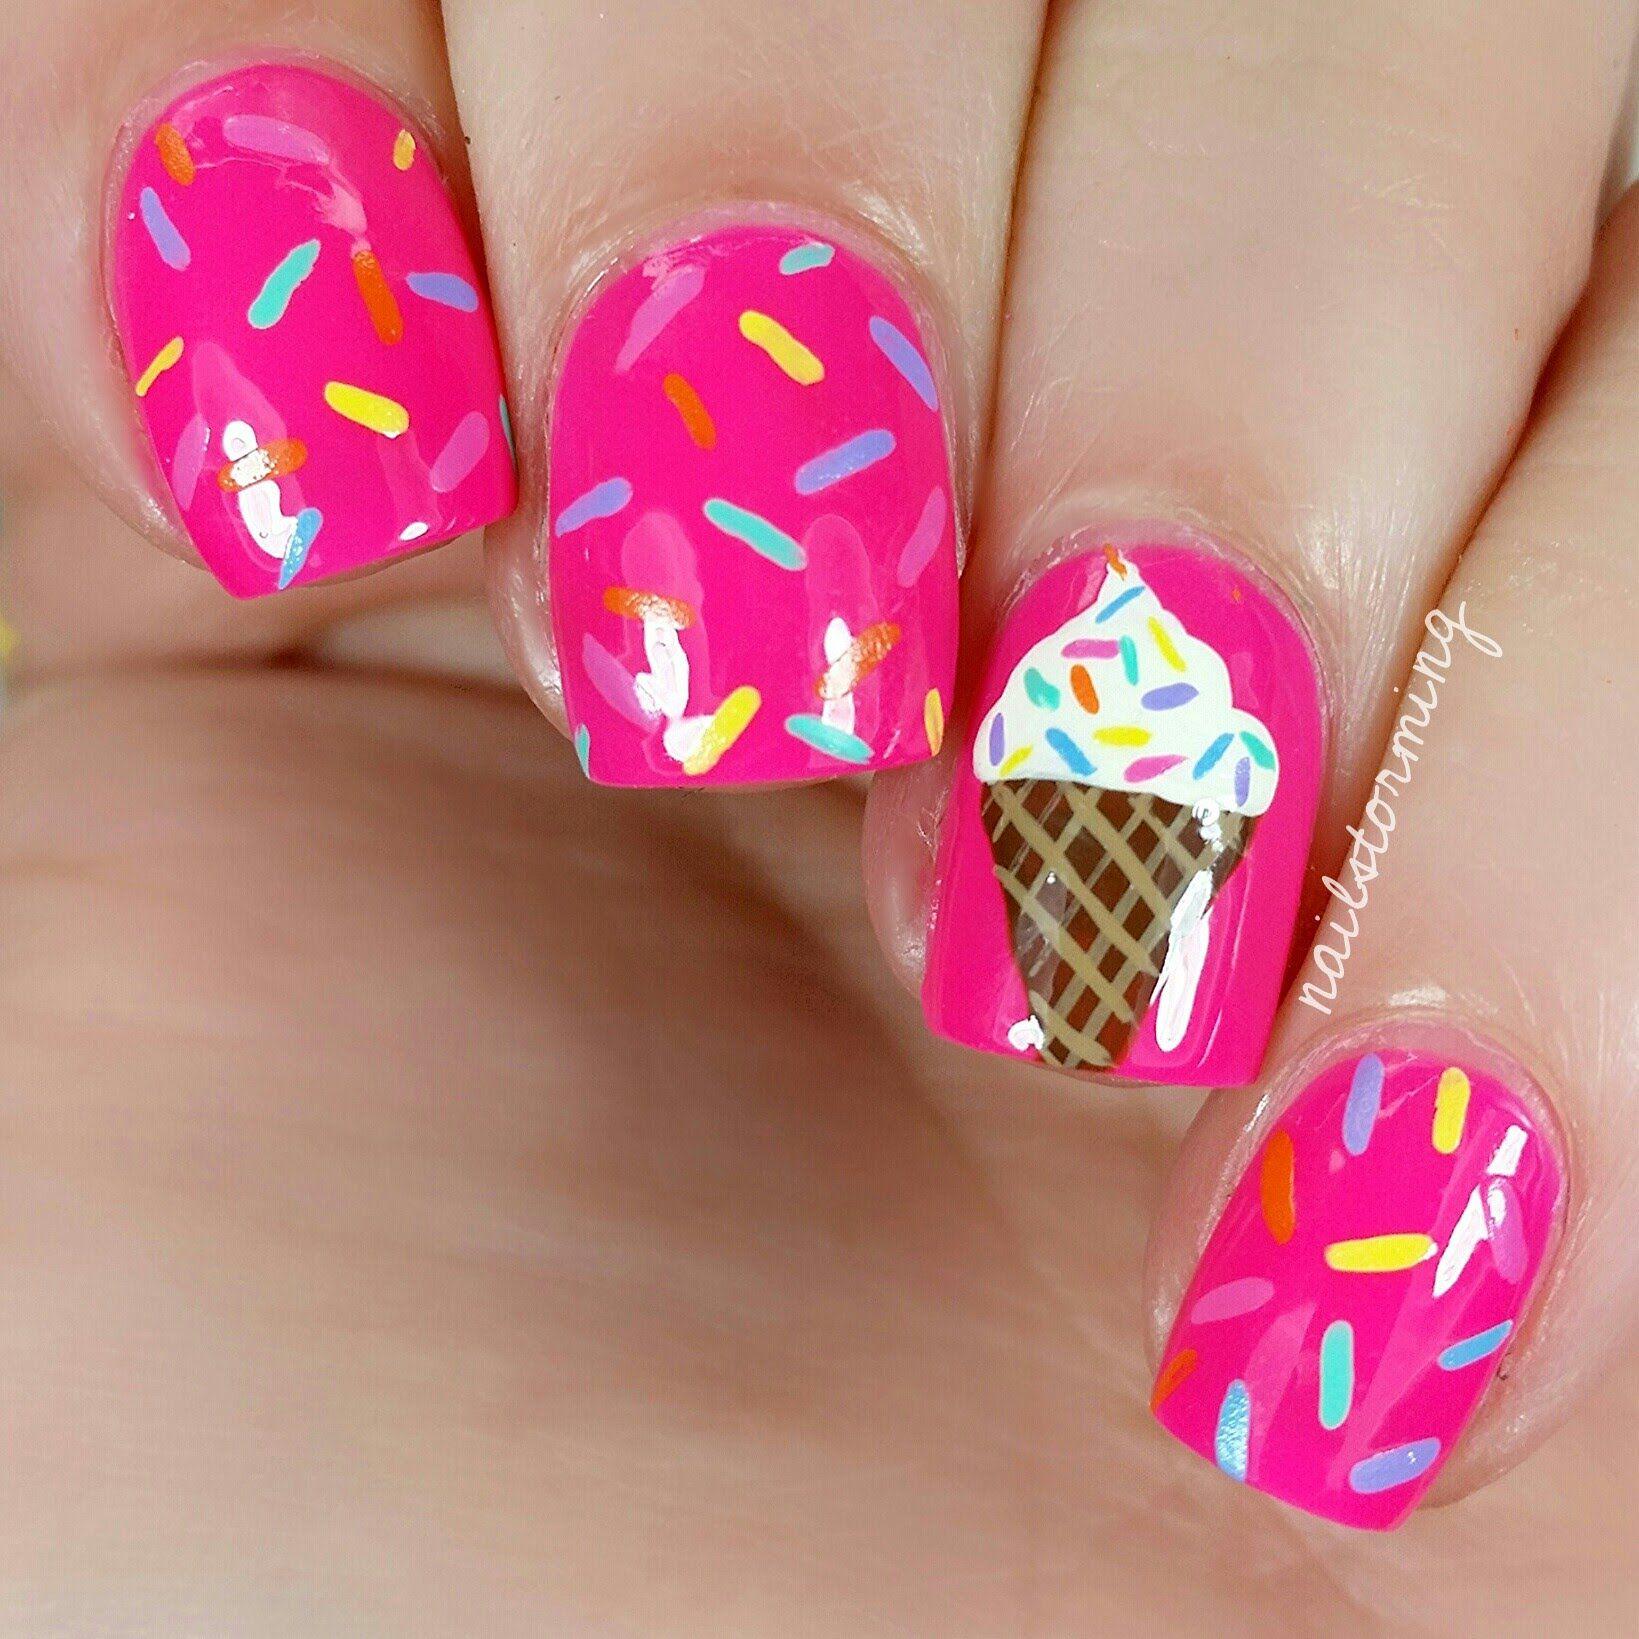 Cream Nail Art: Nail Art Tutorial: Ice Cream Cone